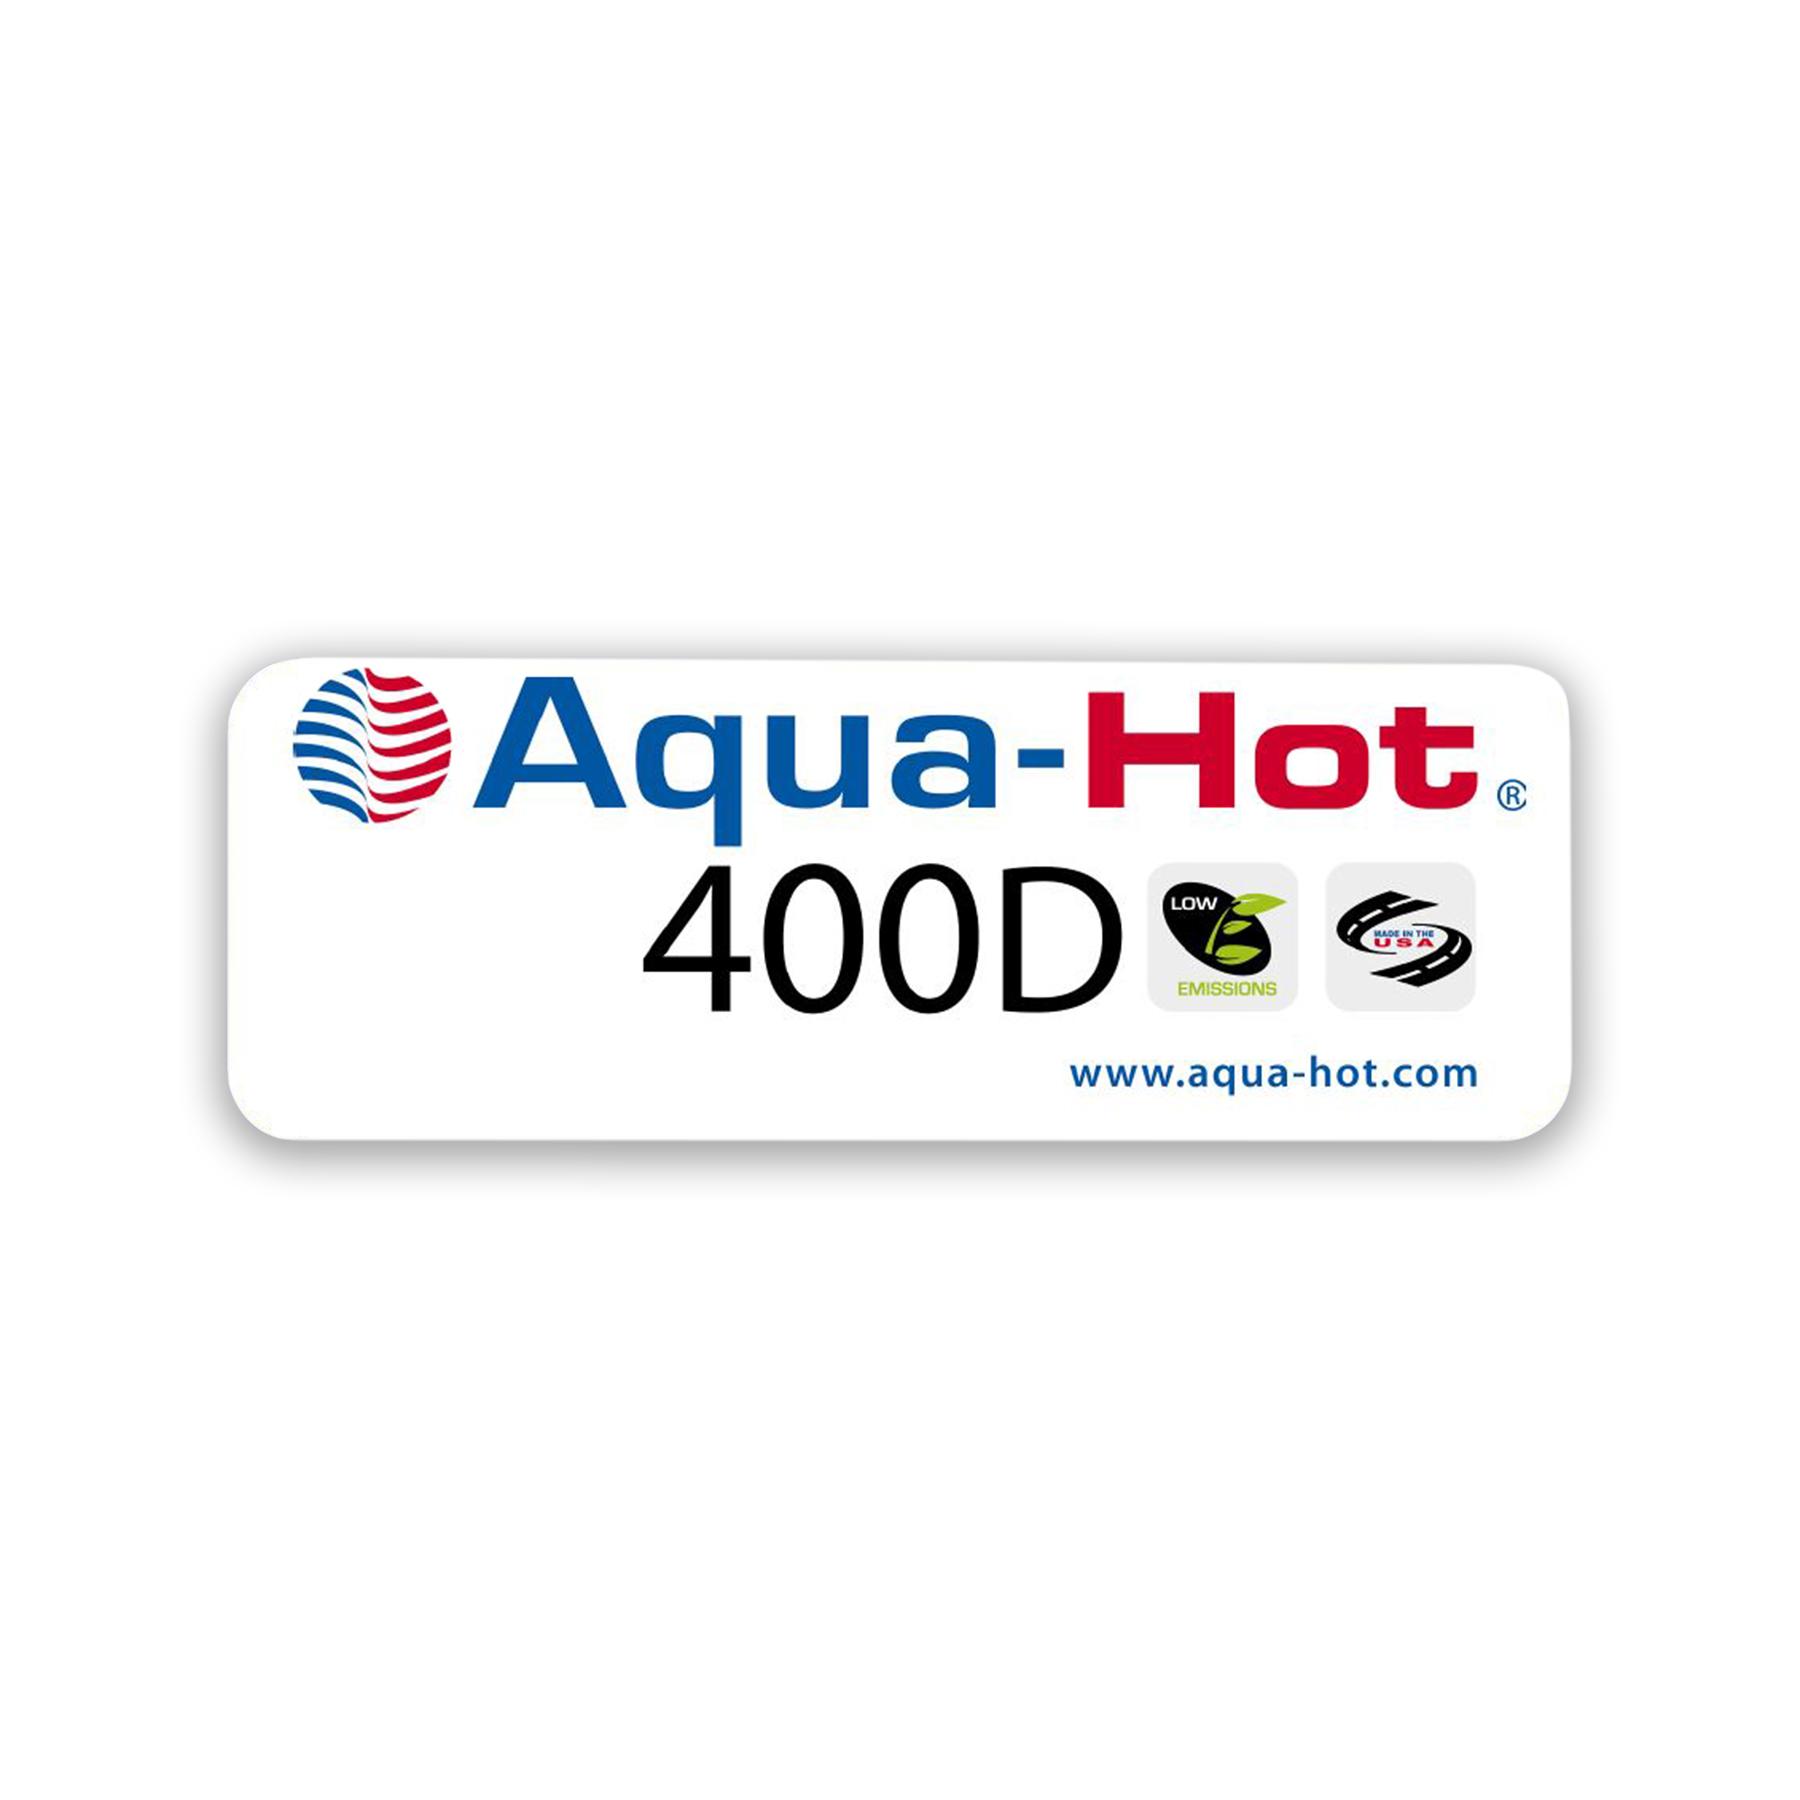 400D Logo Label